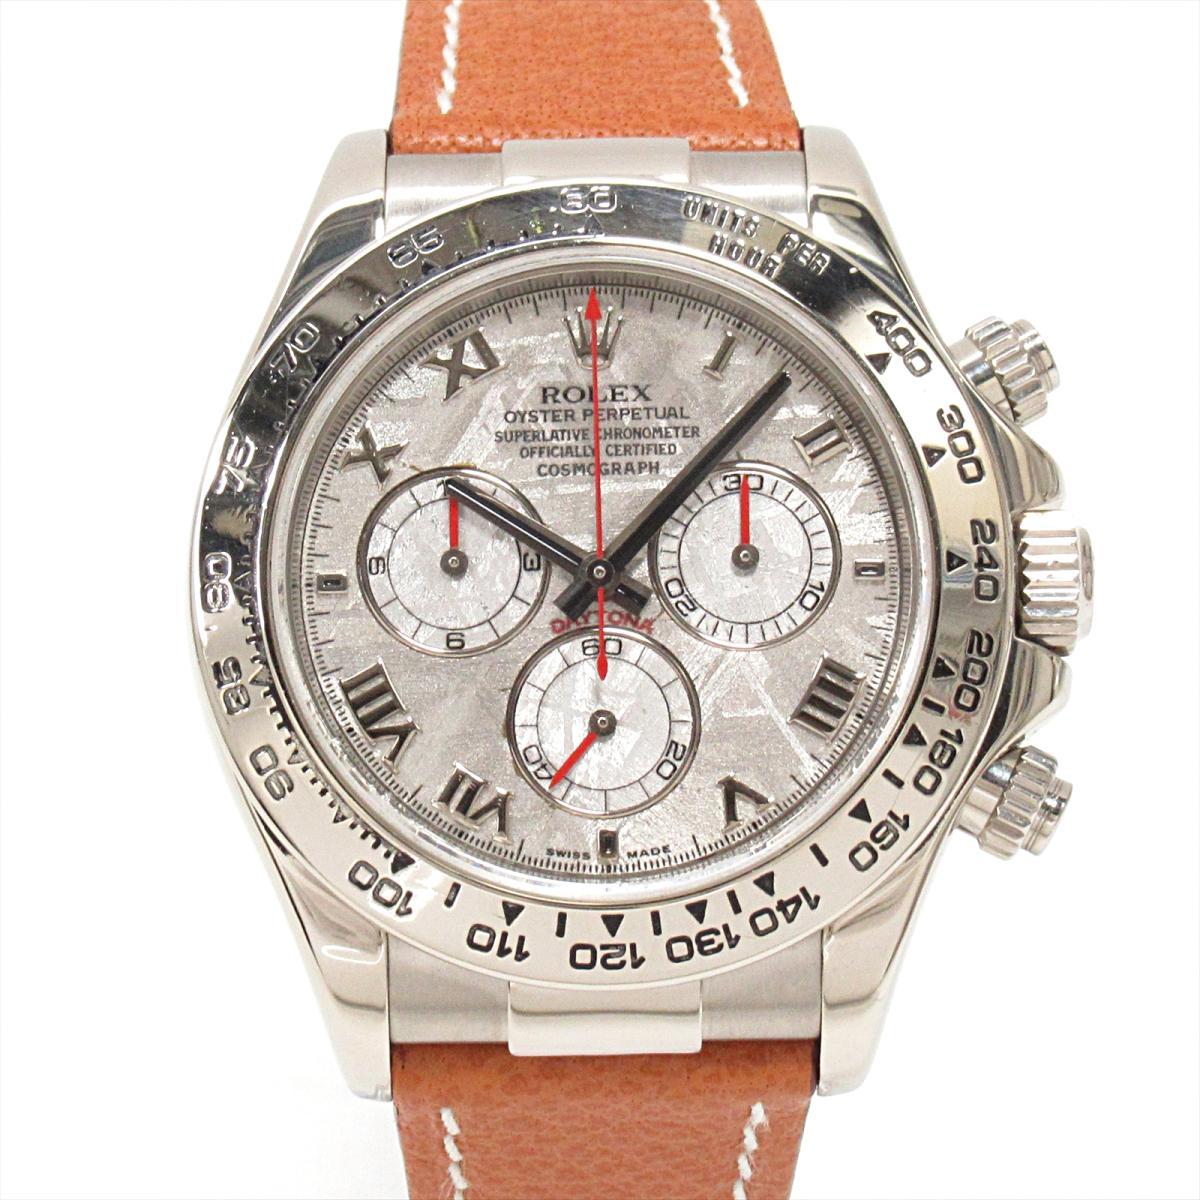 Brandoff Rolex Daytona Watch Watch Clock Men K18wg 750 White Gold